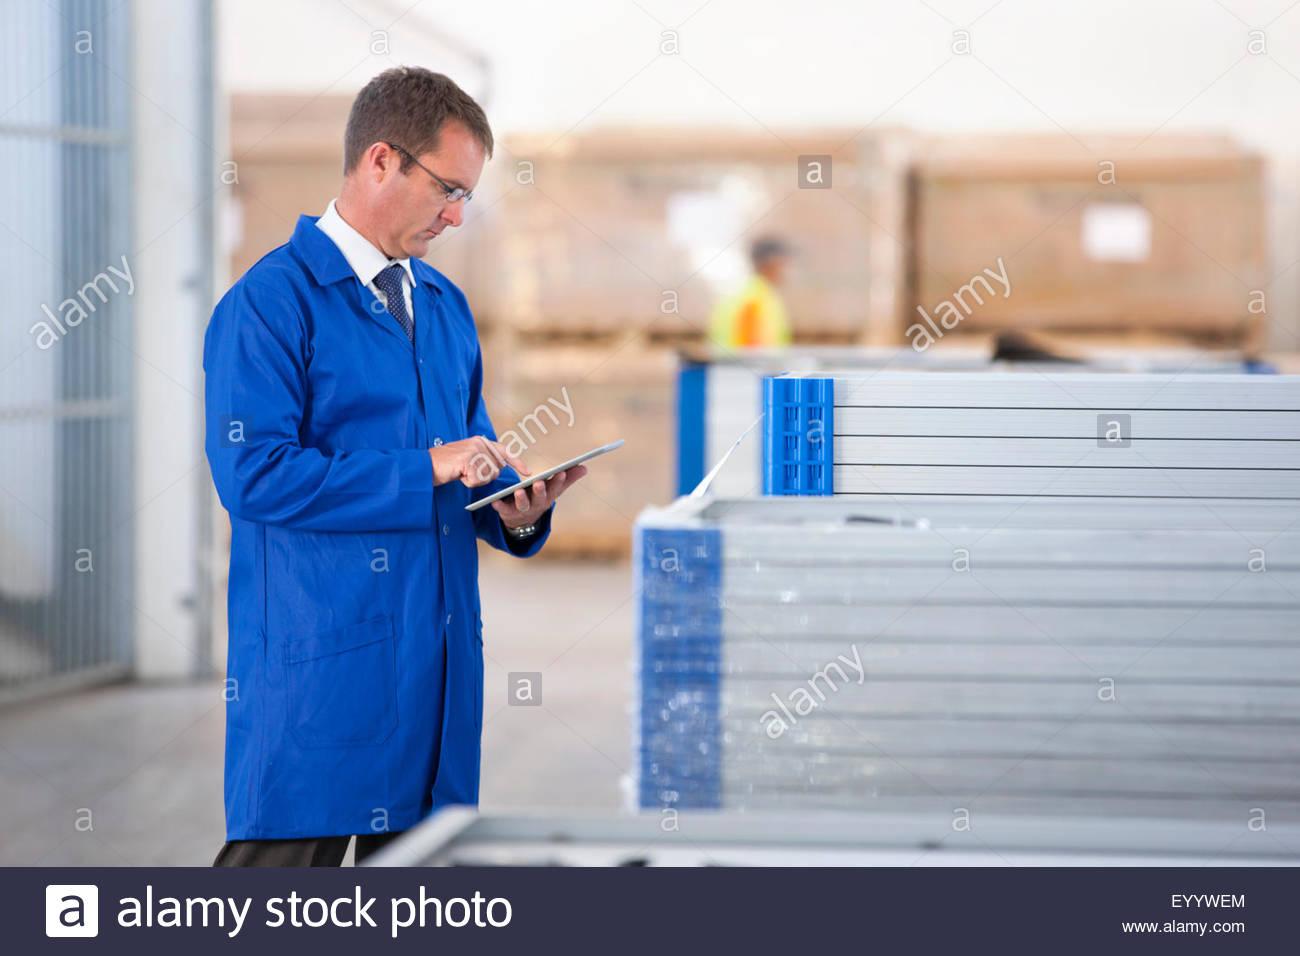 Supervisor worker stock checking solar panels in factory warehouse - Stock Image